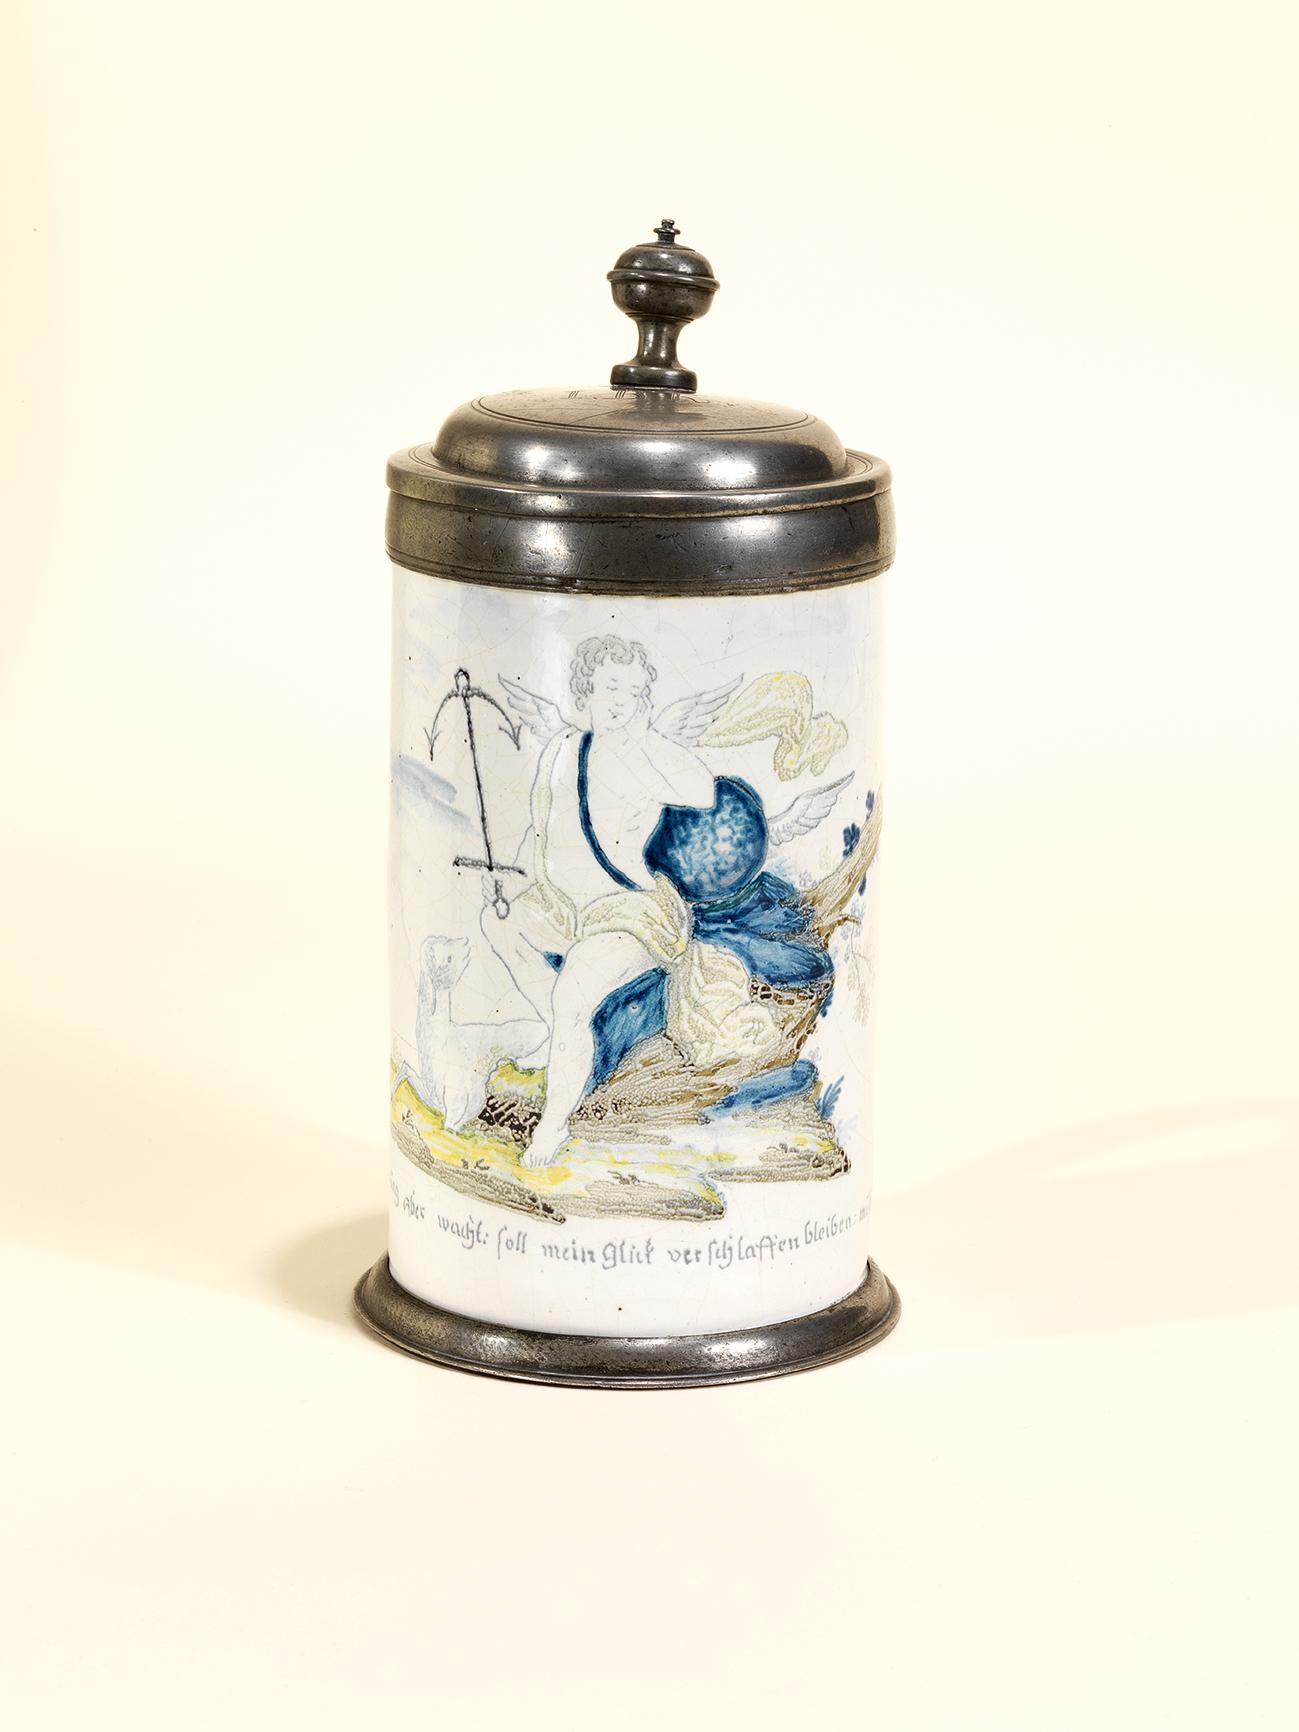 Peter Vogt Fayence München - Friedberger Fayencekrug um 1760